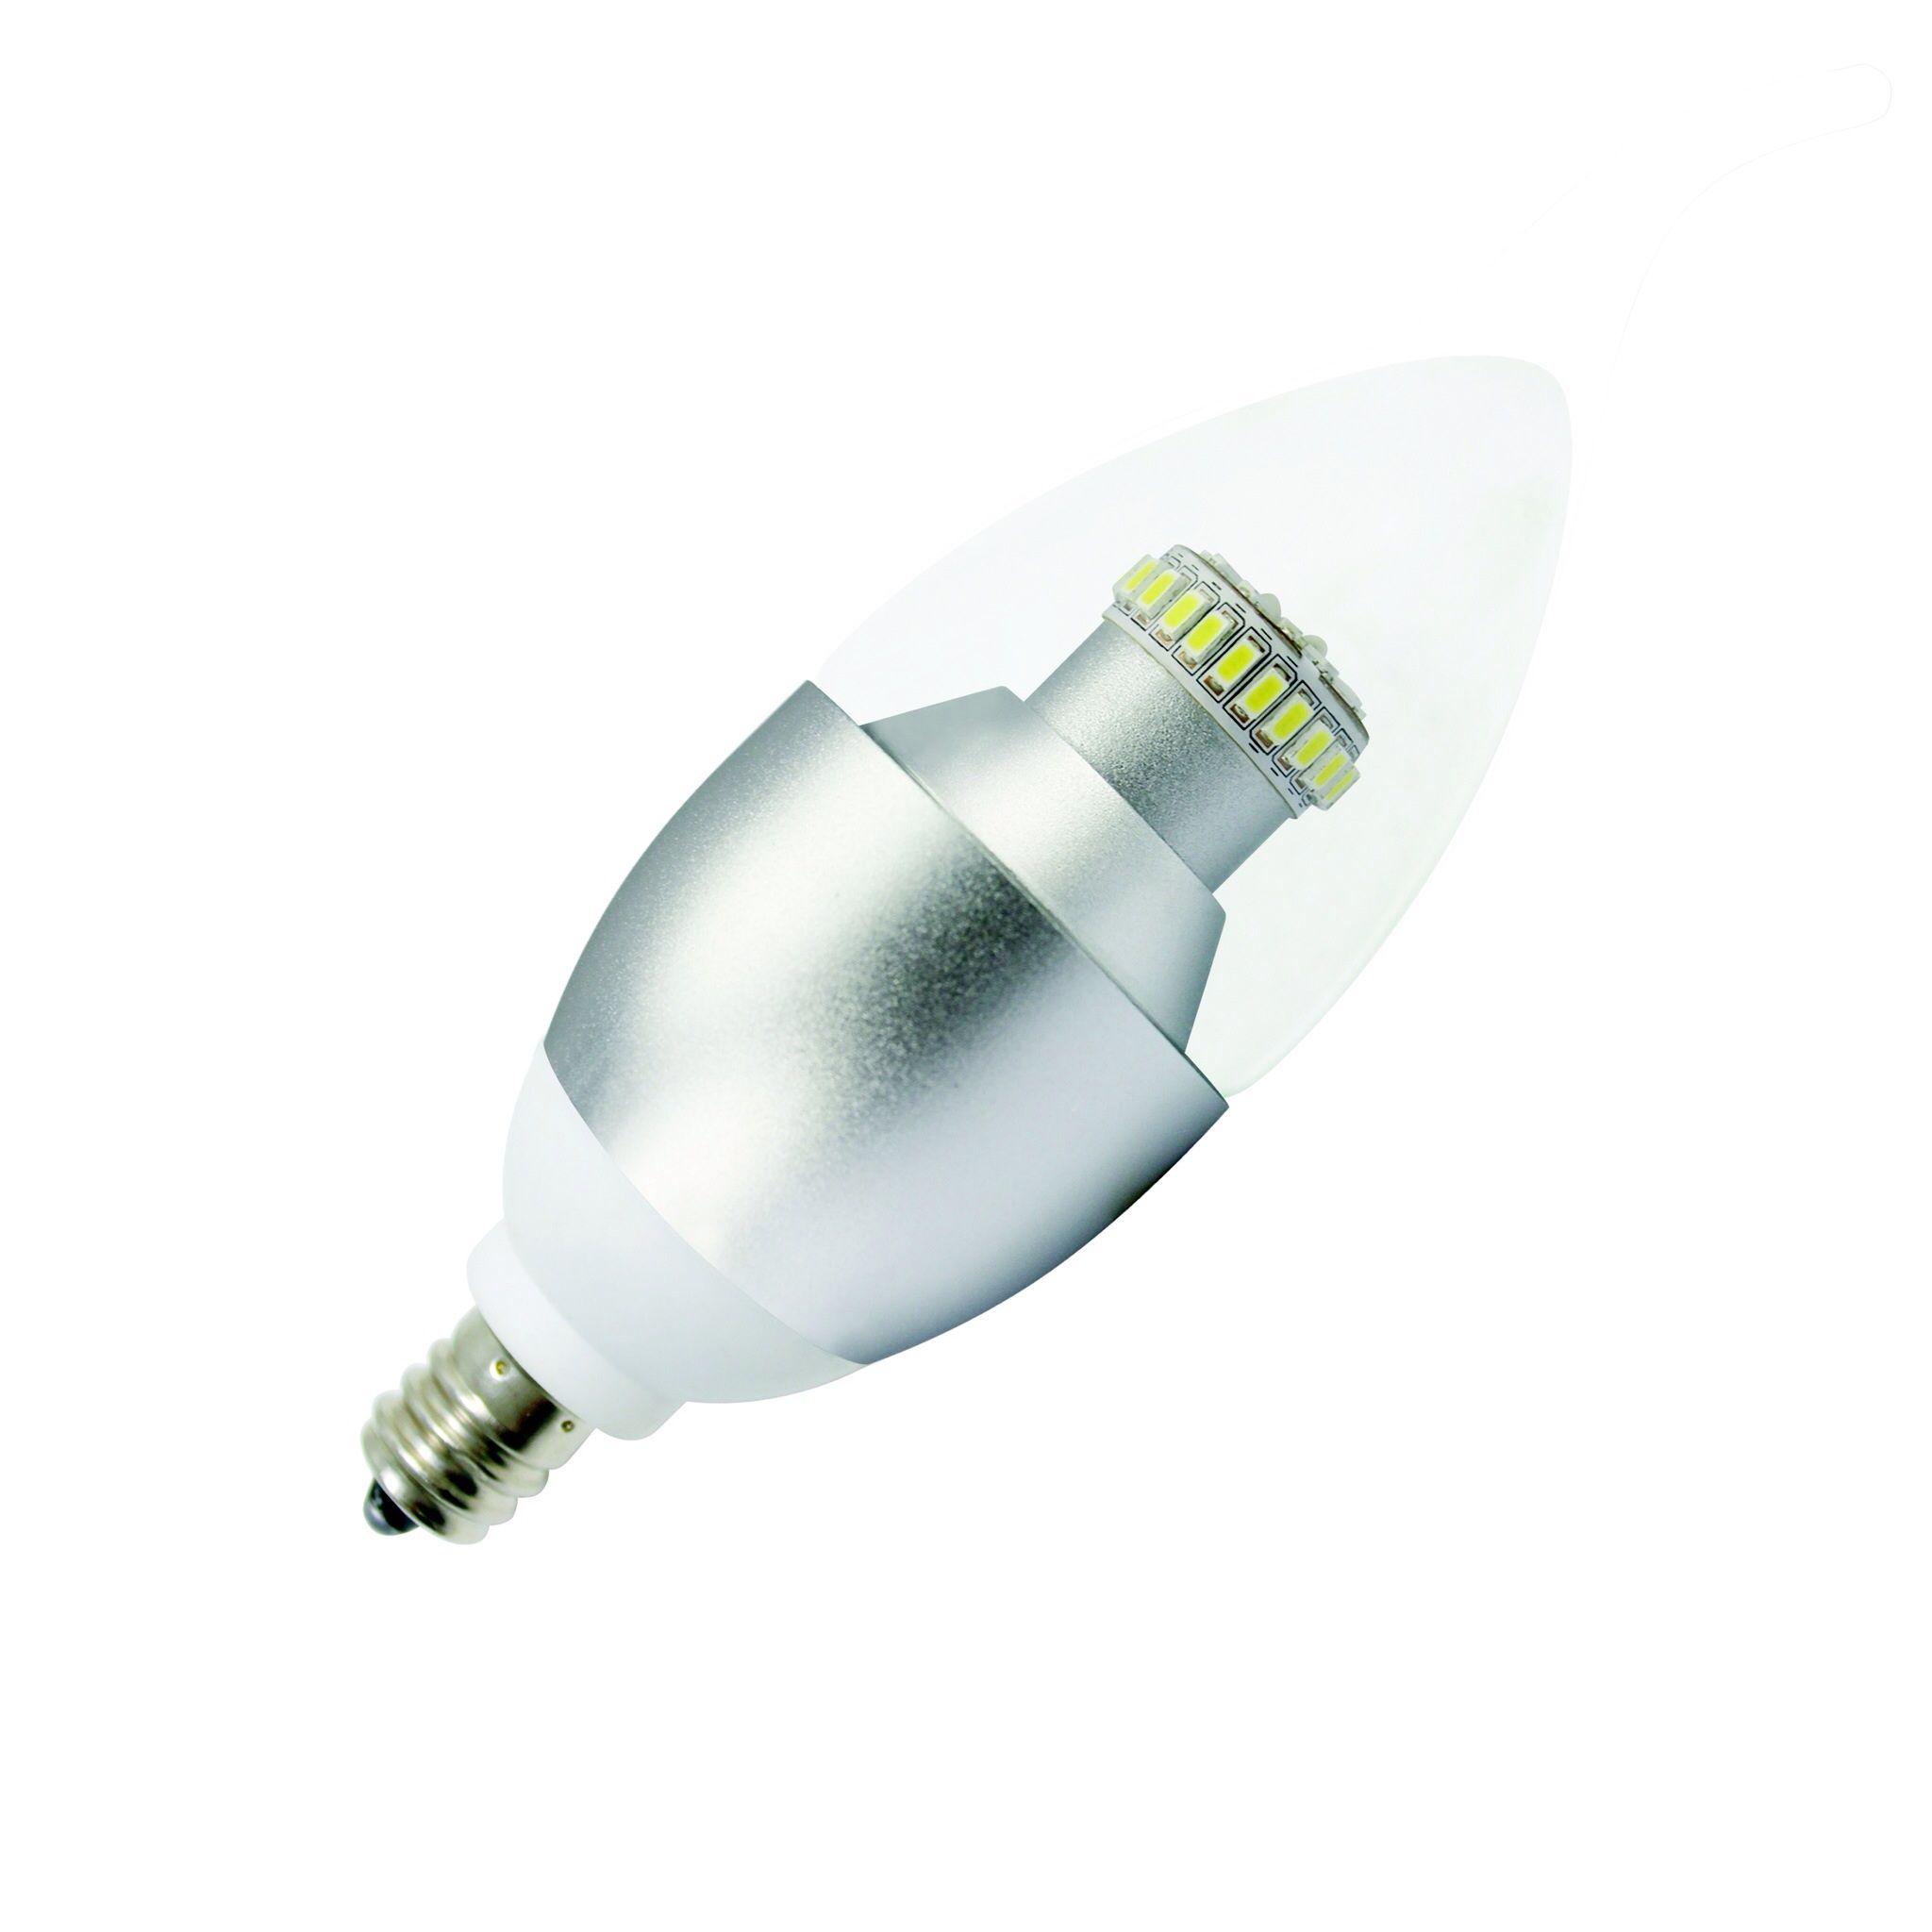 tForce 6W LED E14 Candle Light Bulb Clear Cover